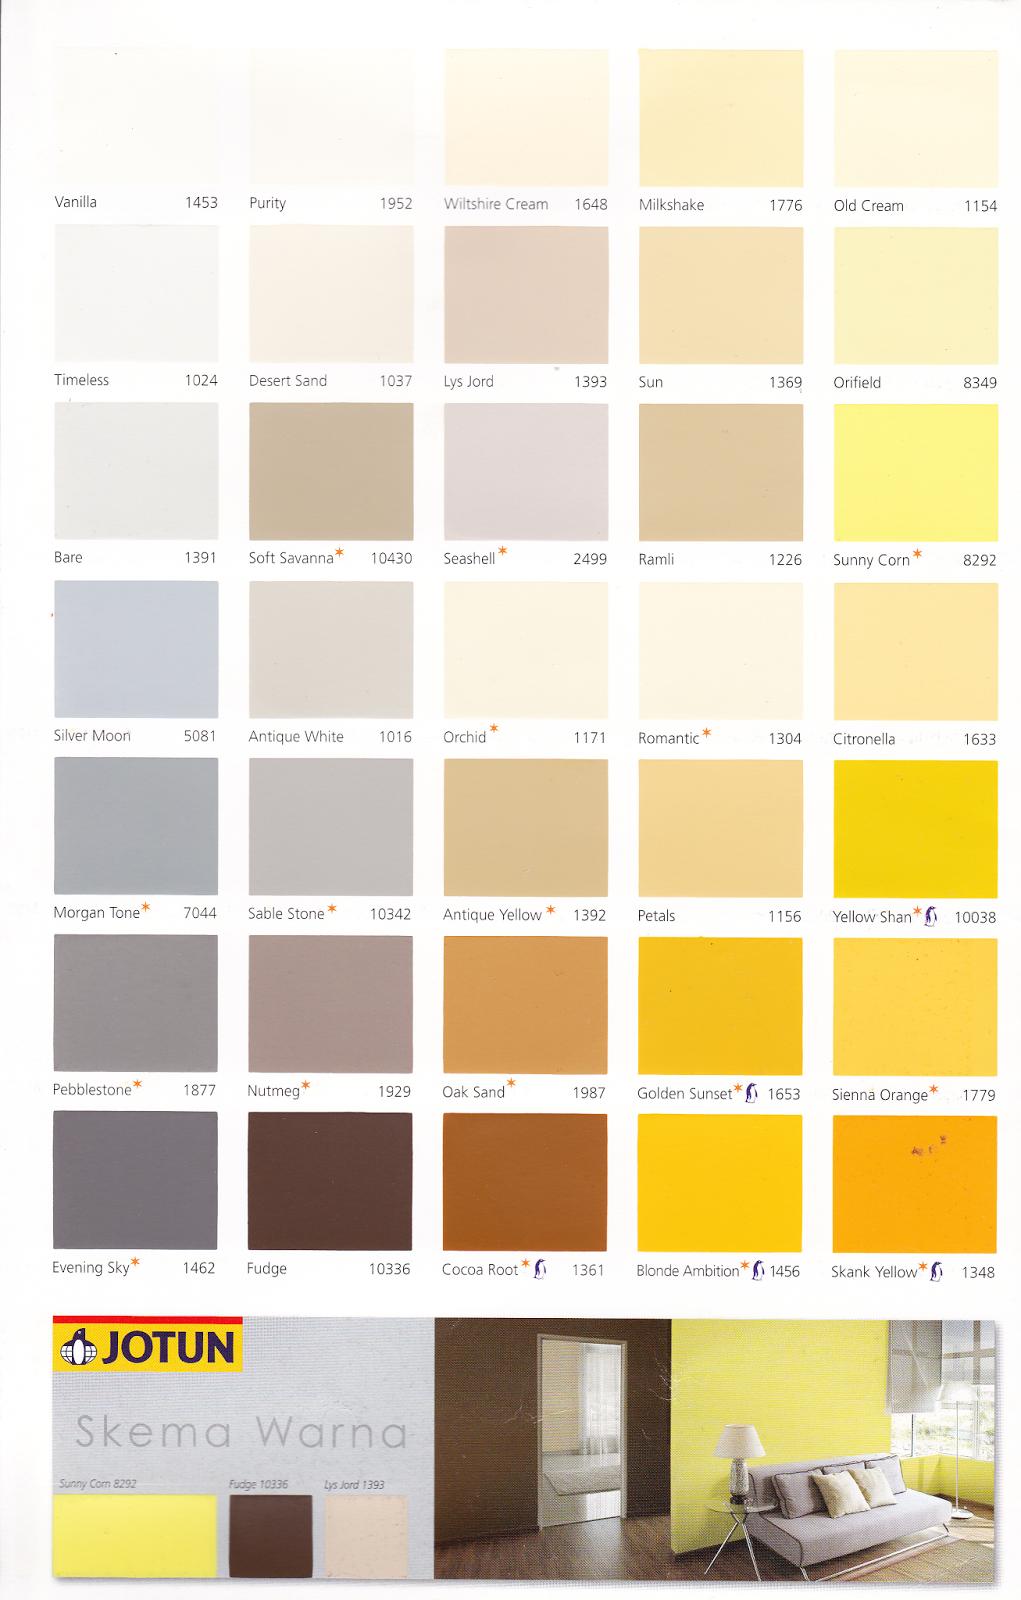 16 Ide Warna Cat Rumah Minimalis Merk Jotun